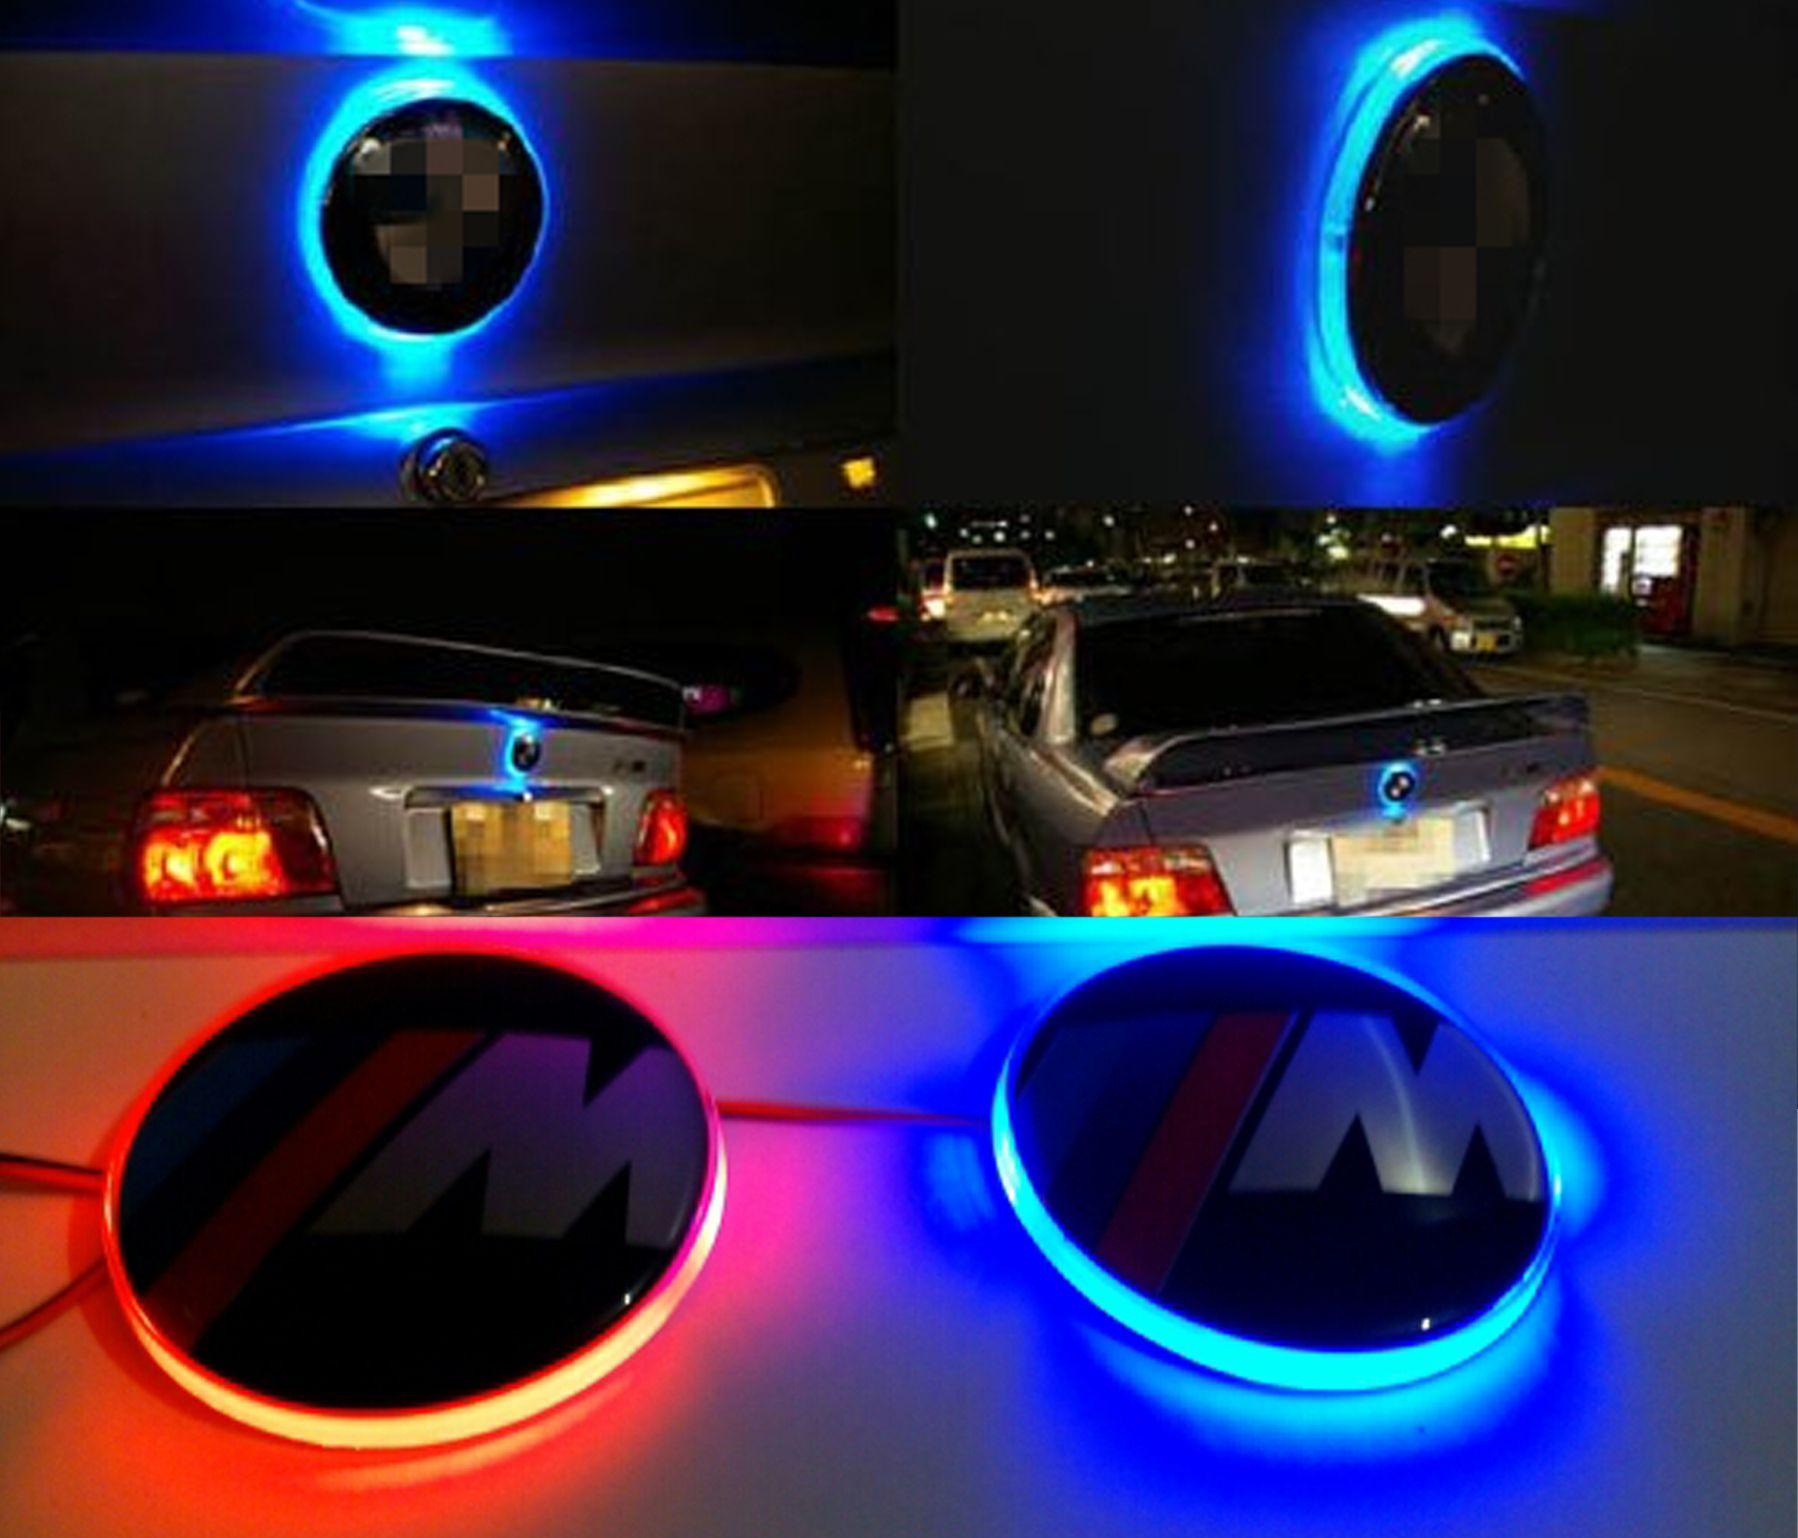 Spedizione gratuita LED Car Decal Sticker Logo Badge Emblem Light Lampada 12 V BMW 3 5 7 Serie Rosso Bianco Blu Colore Promozione della fabbrica Vendita calda